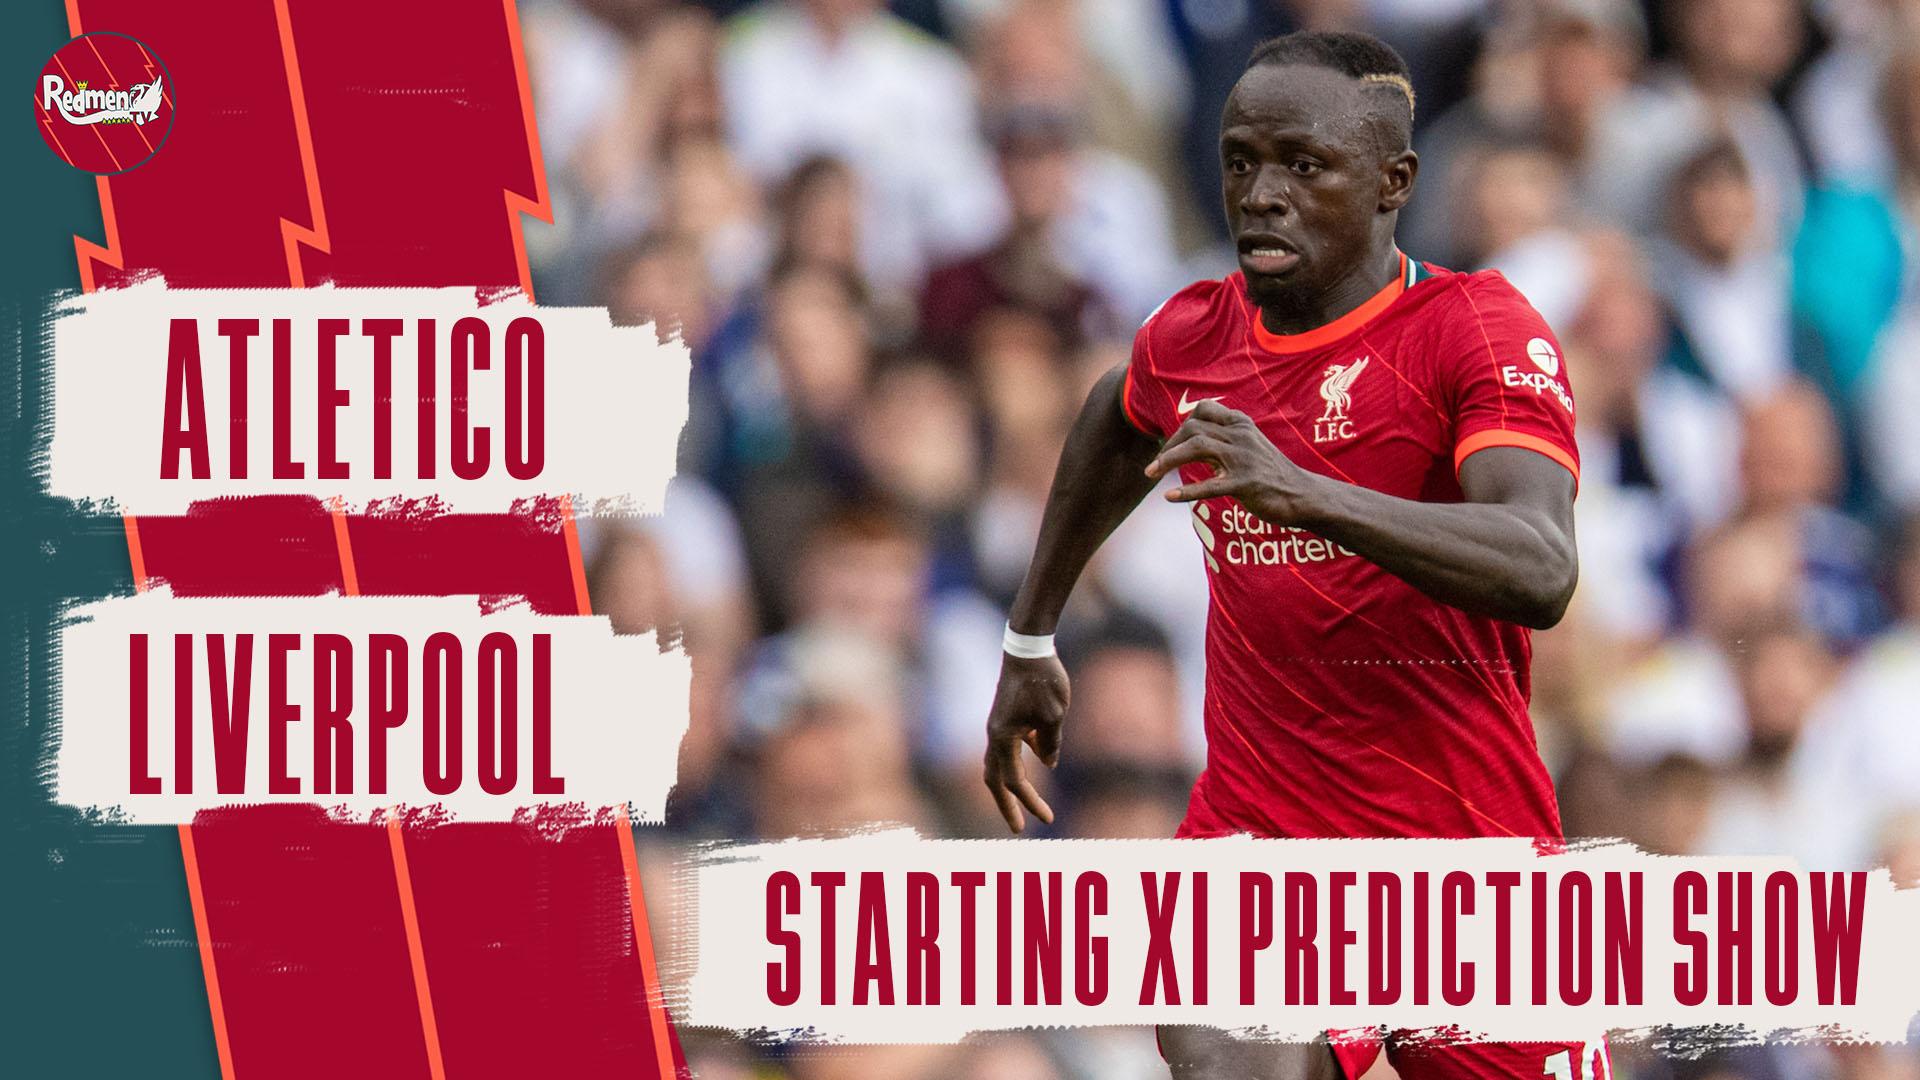 Atletico Madrid v Liverpool | Starting XI Prediction Show – The Redmen TV